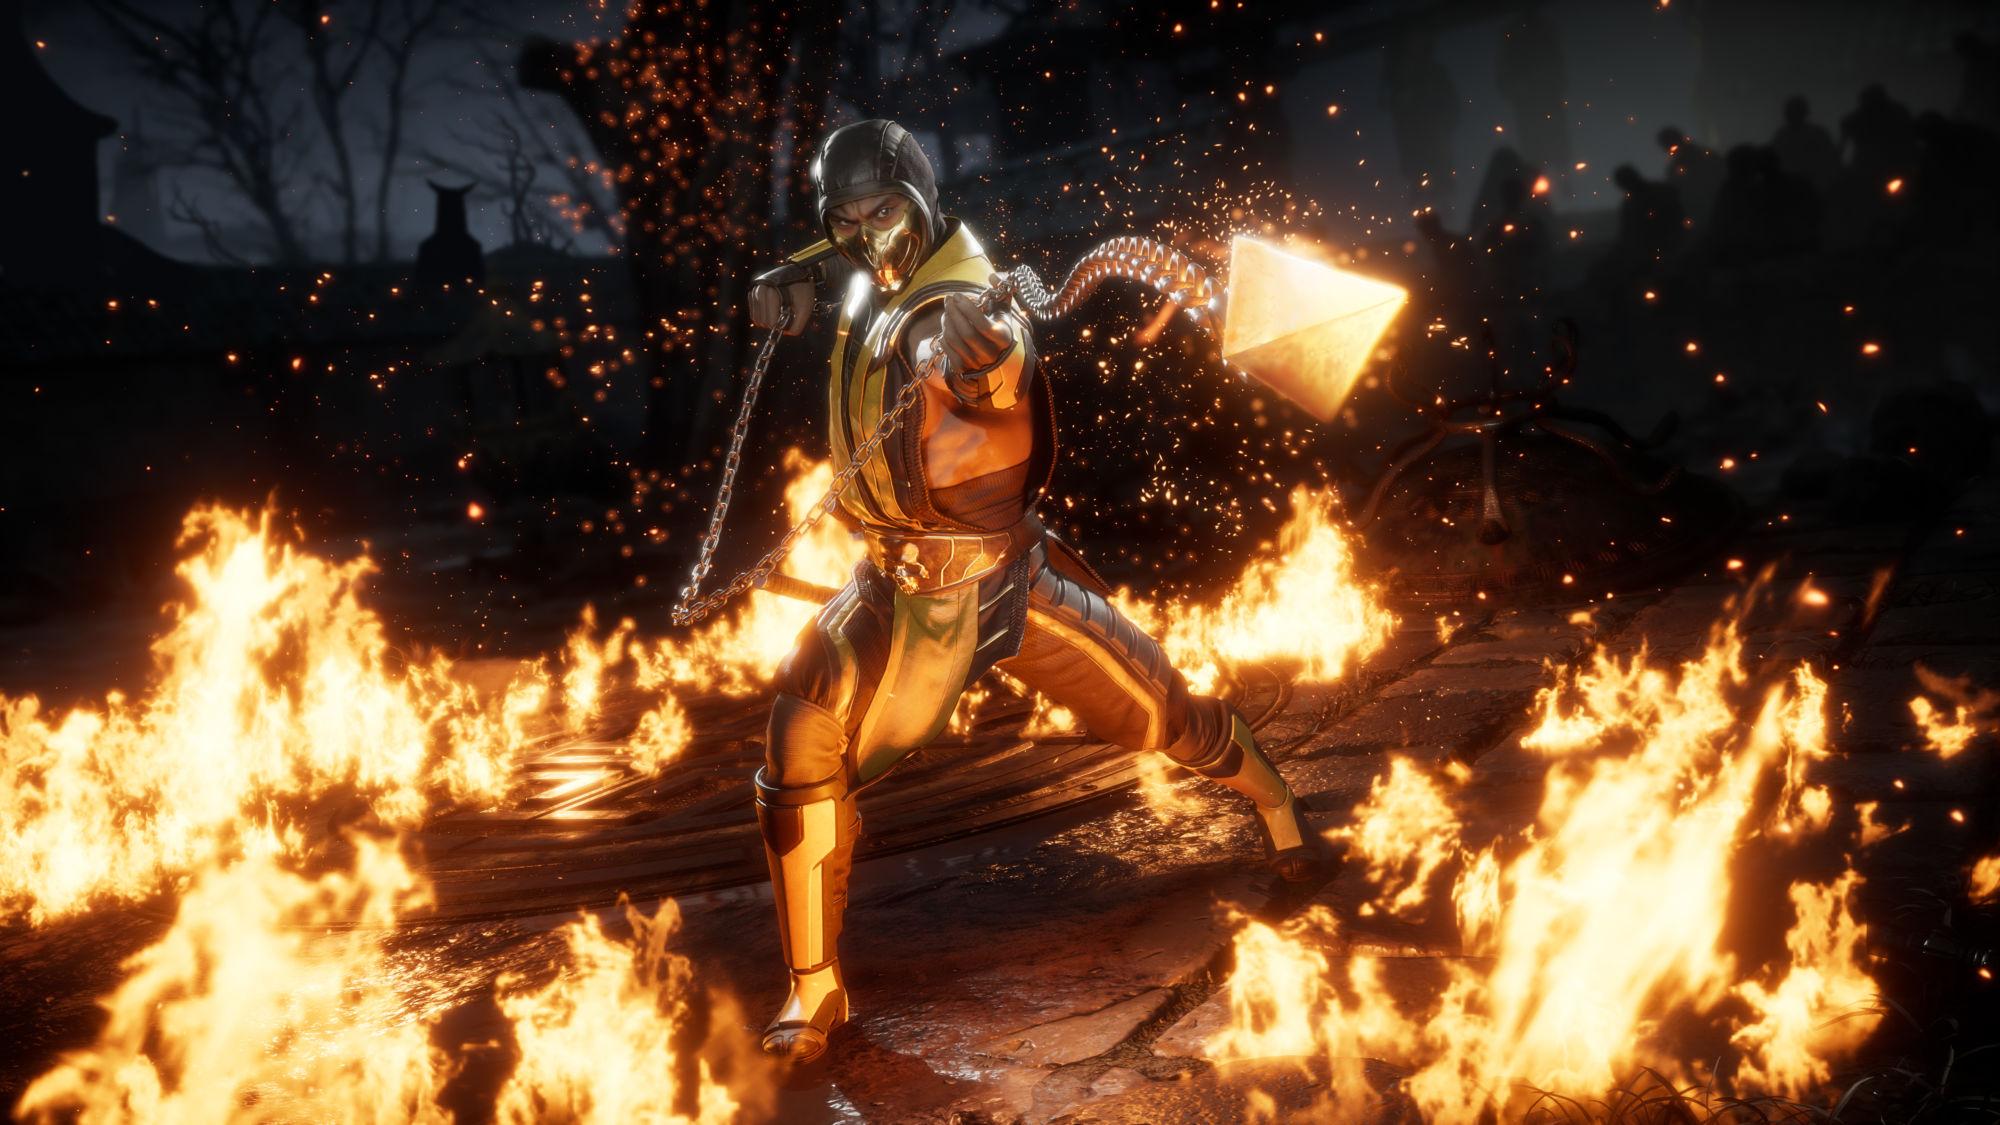 Steam Database May Have Leaked Several Mortal Kombat 11